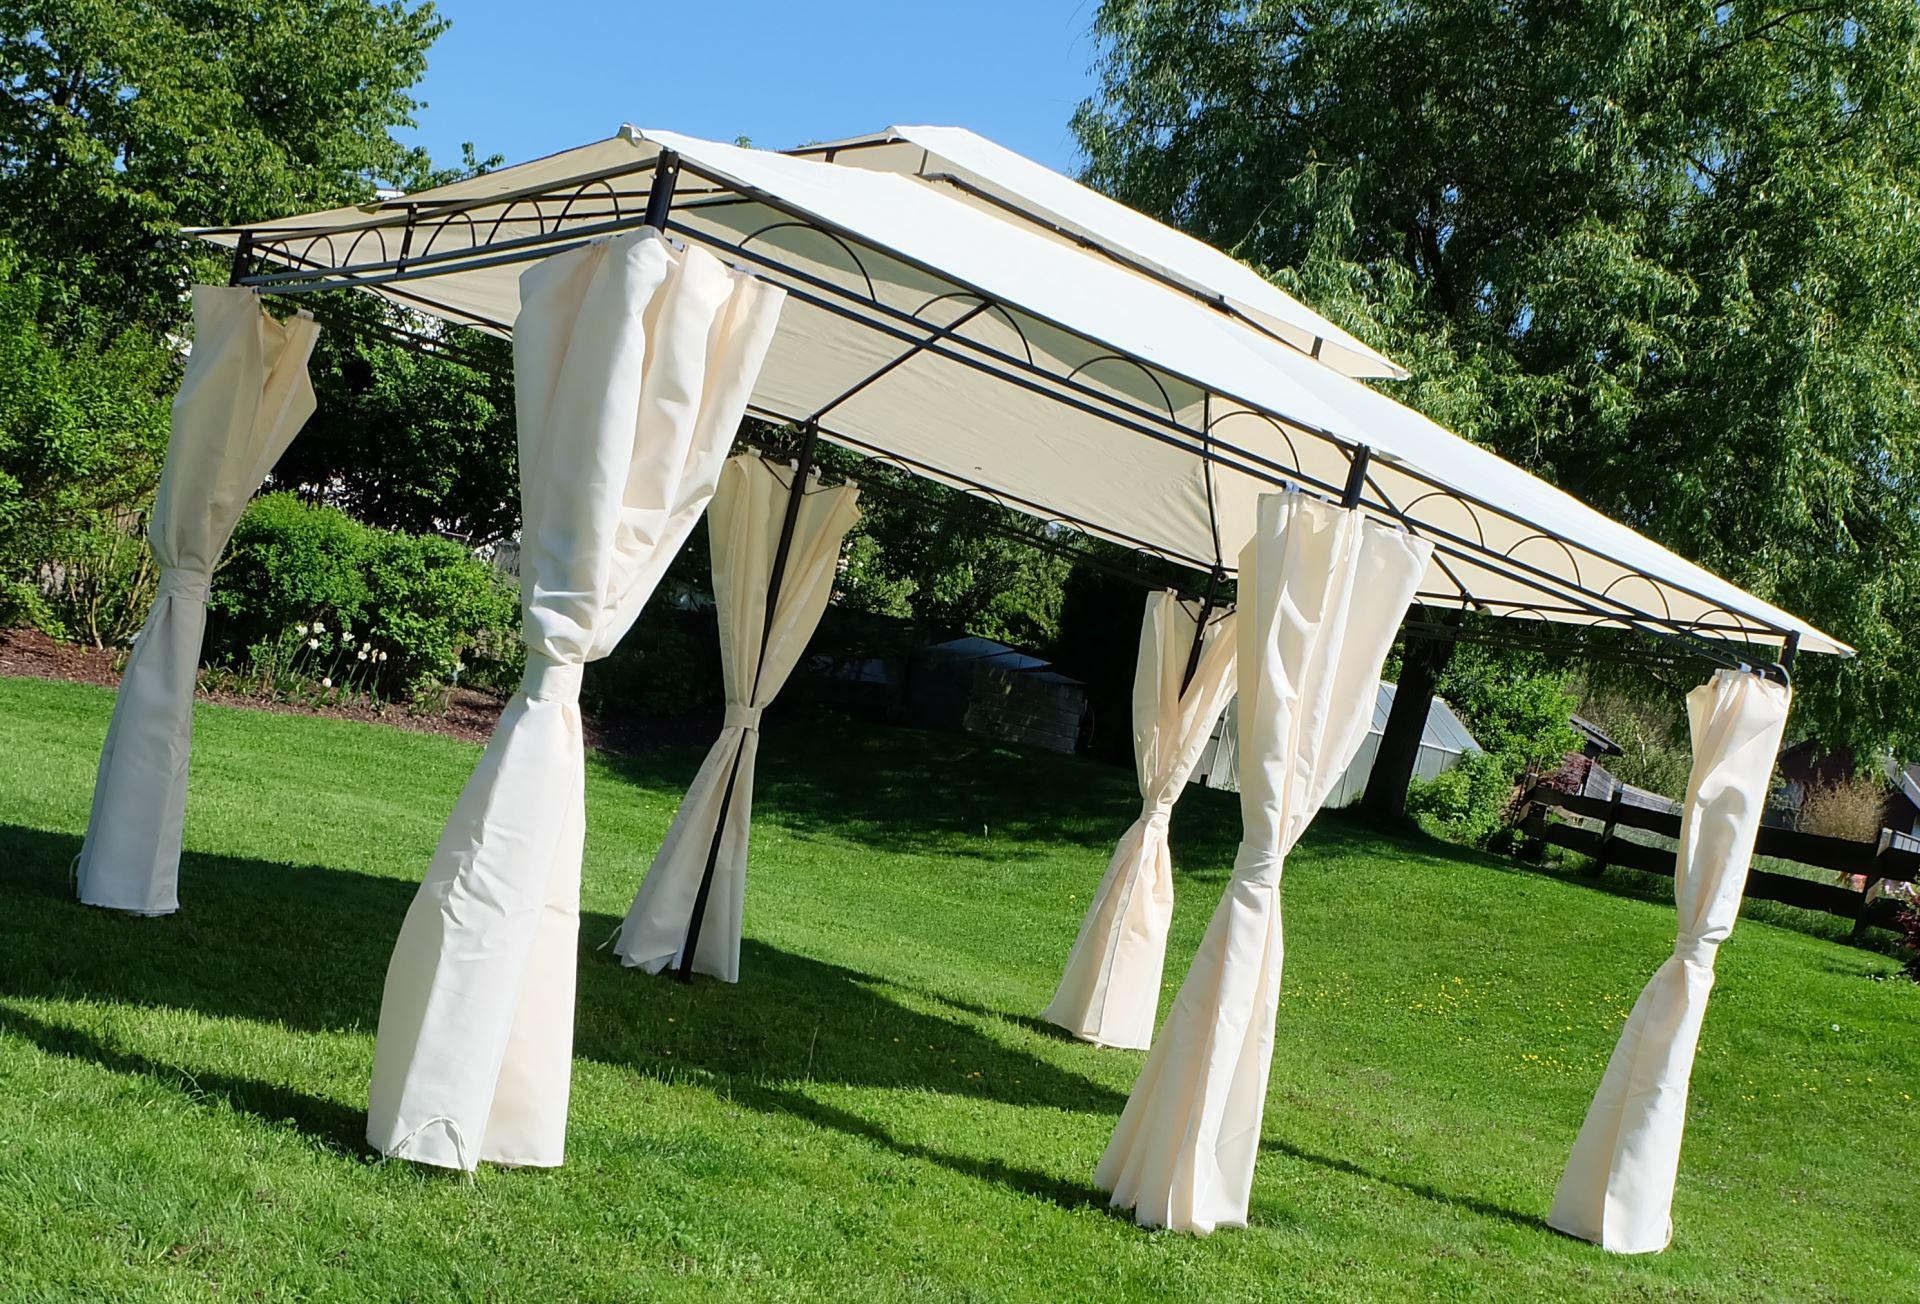 eleganter gartenpavillon pavillon 3x4 meter 12m dach 100 wasserdicht uv30 mit 6 vorh ngen. Black Bedroom Furniture Sets. Home Design Ideas